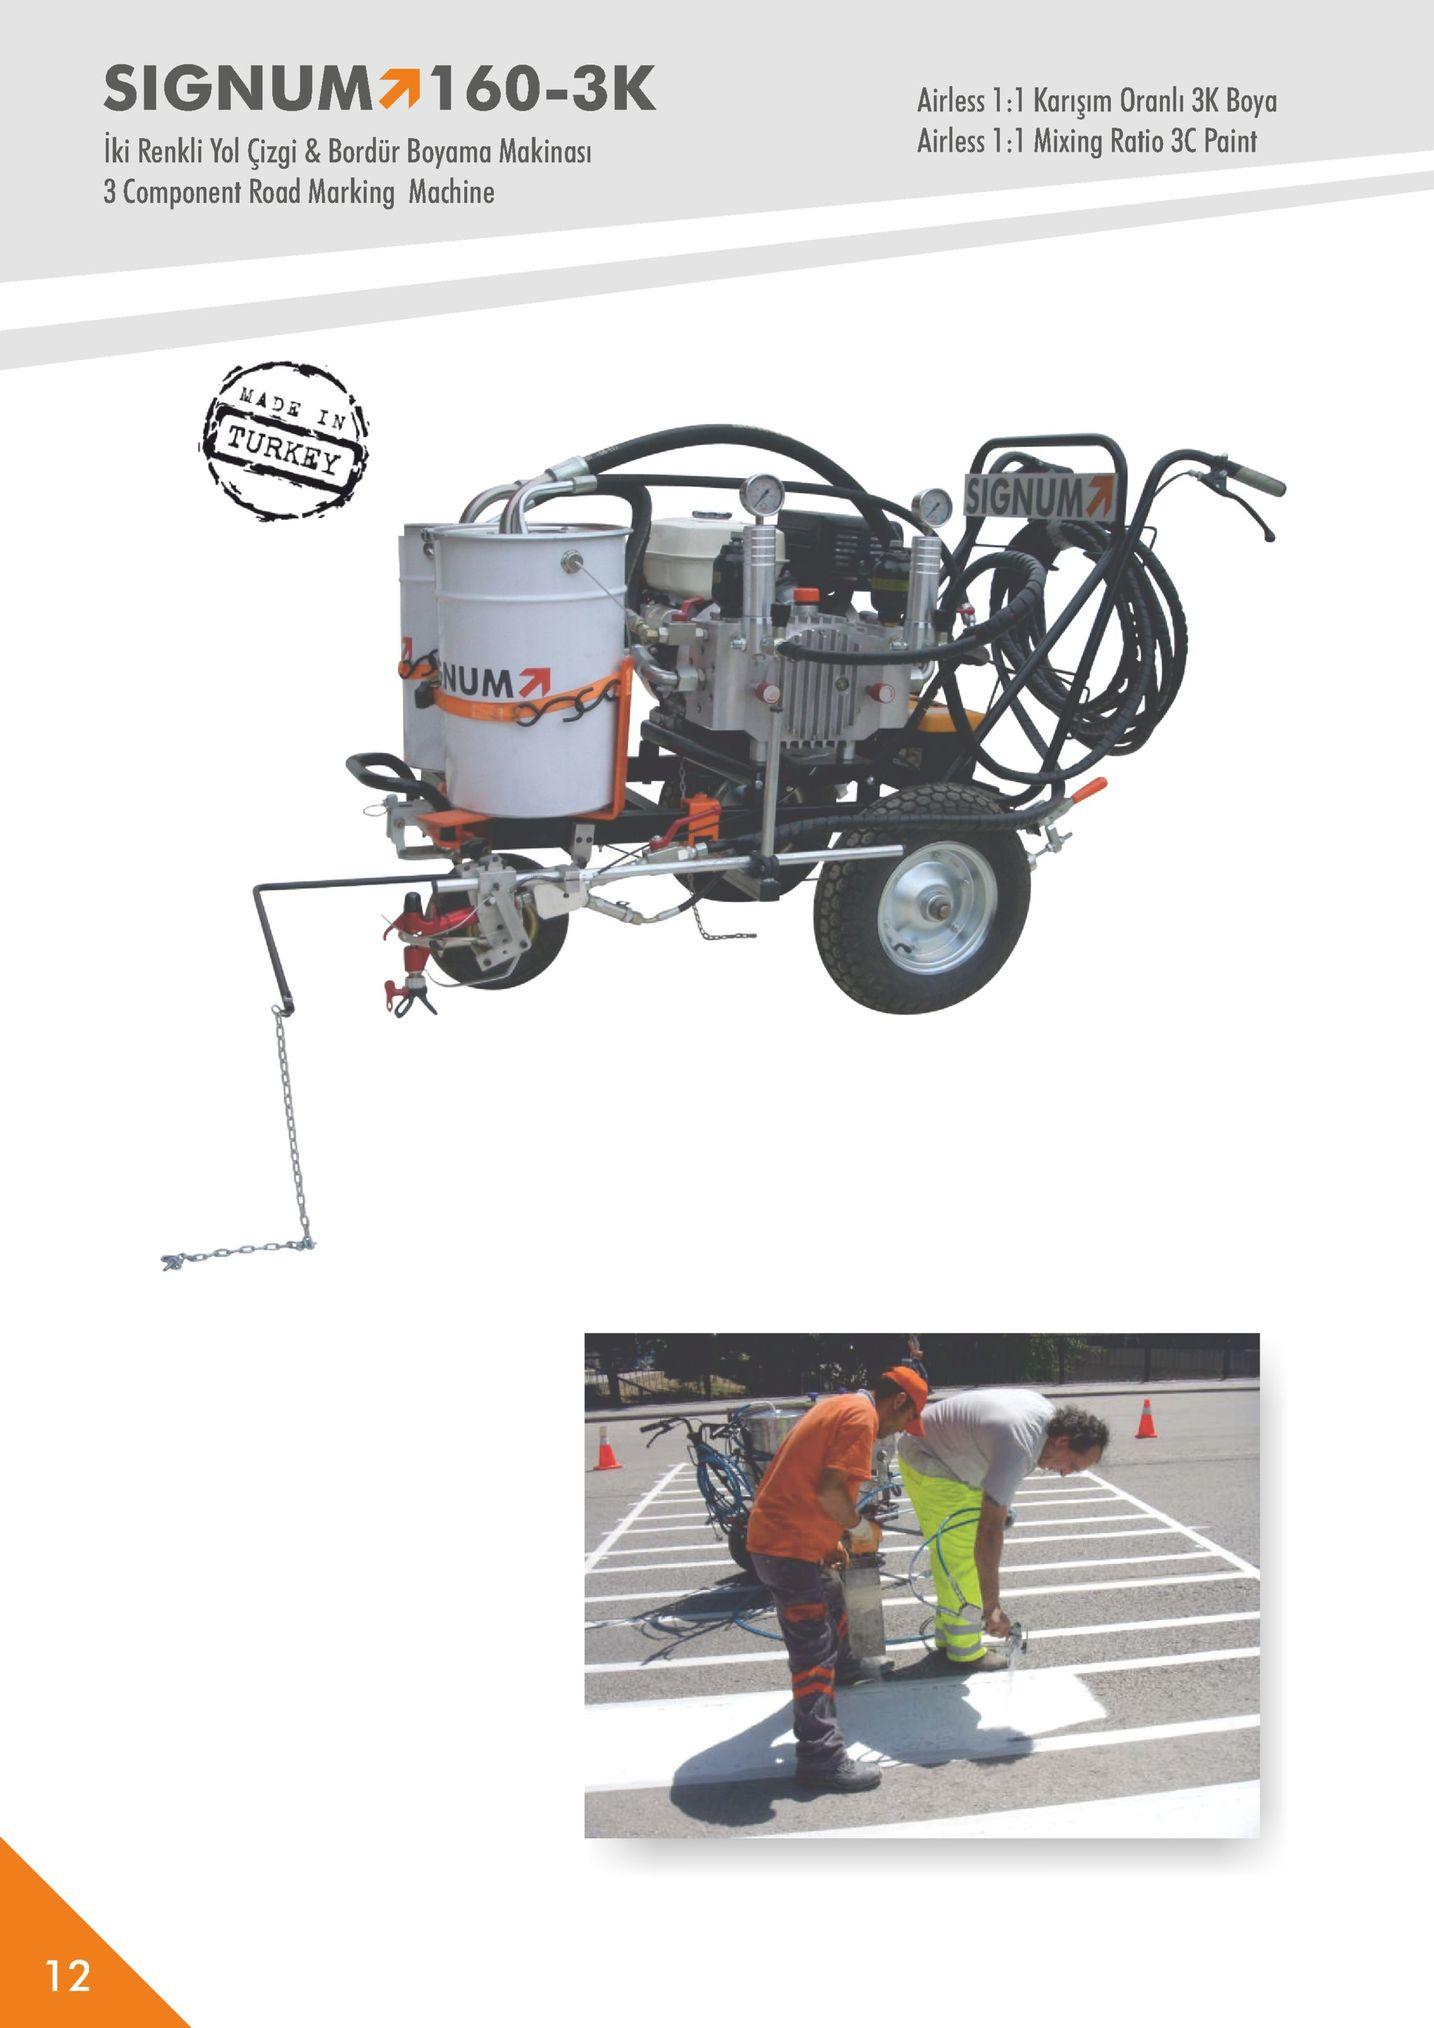 signum 160-3k airless 1:1 karişım oranli 3k boya airless 1:1 mixing ratio 3c paint iki renkli yol çizgi & bordür boyama makinasi 3 component road marking machine * in num기